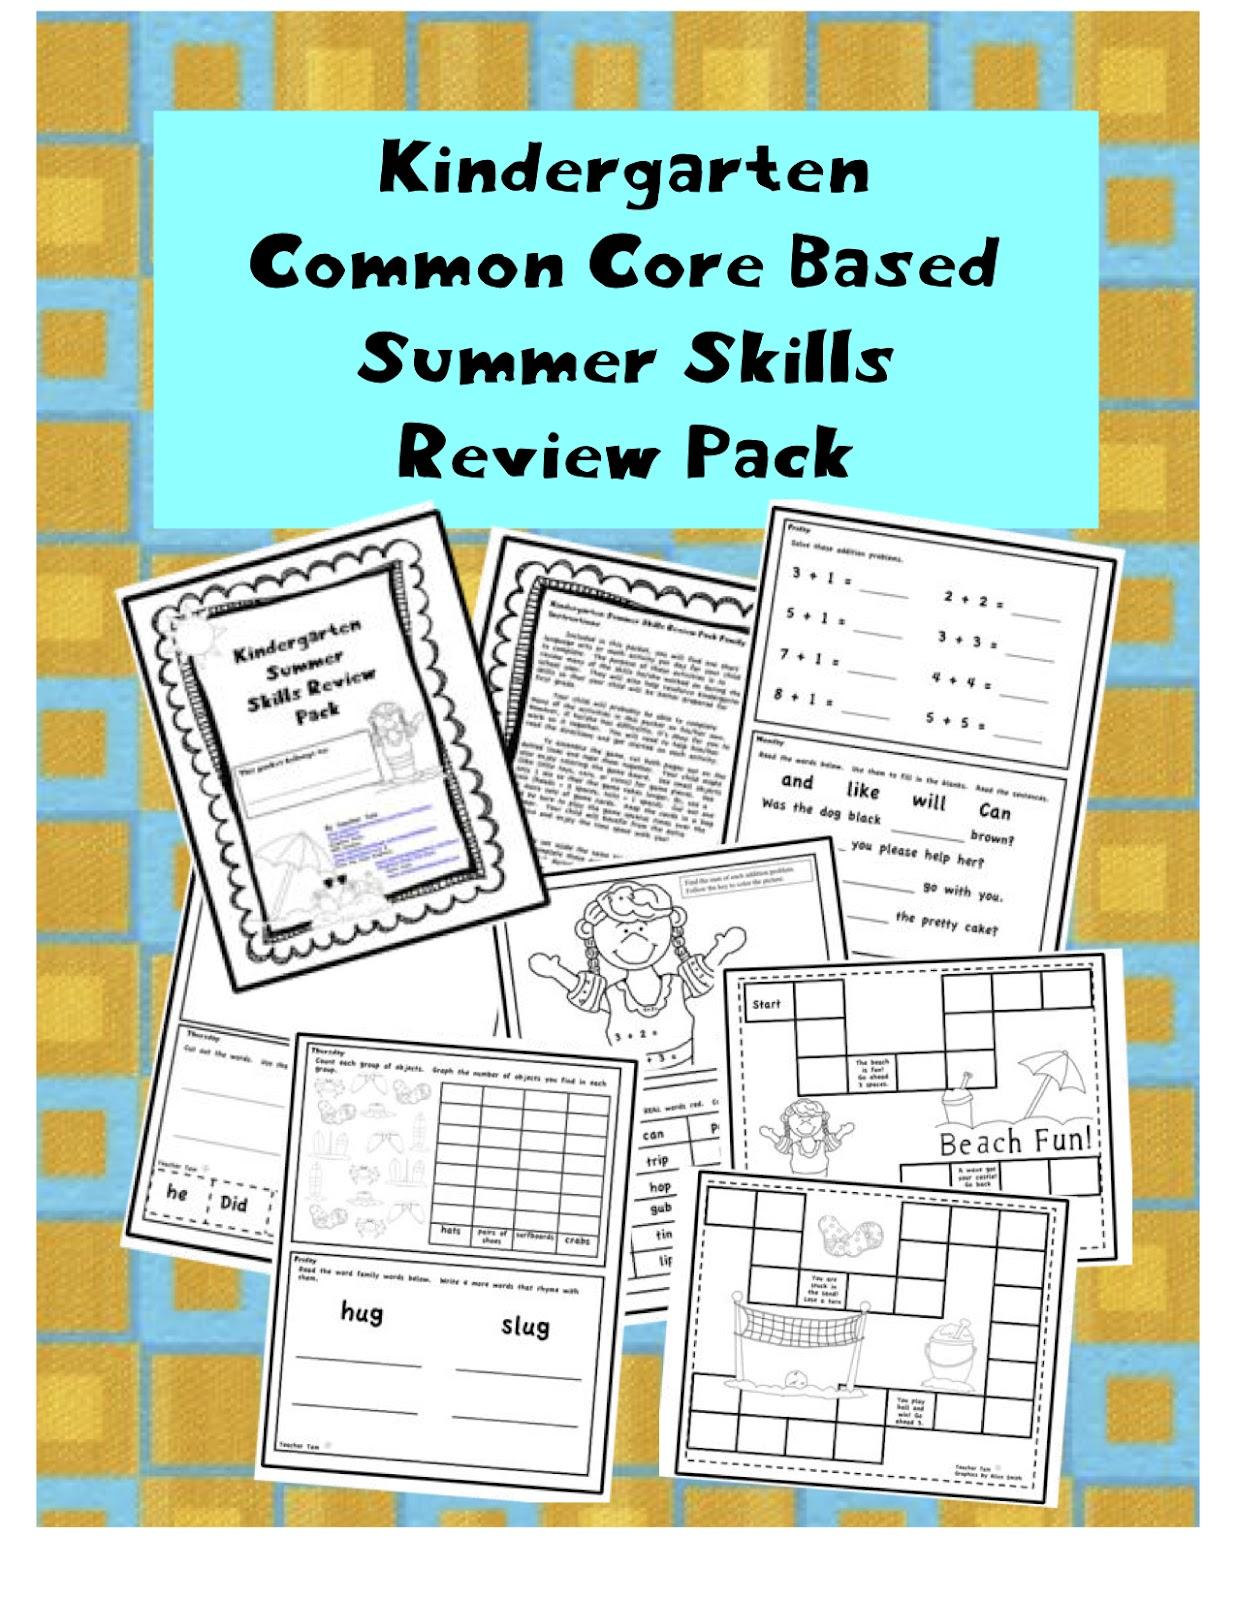 Teacher Tam S Educational Adventures Kindergarten Common Core Based Summer Skills Review Packet